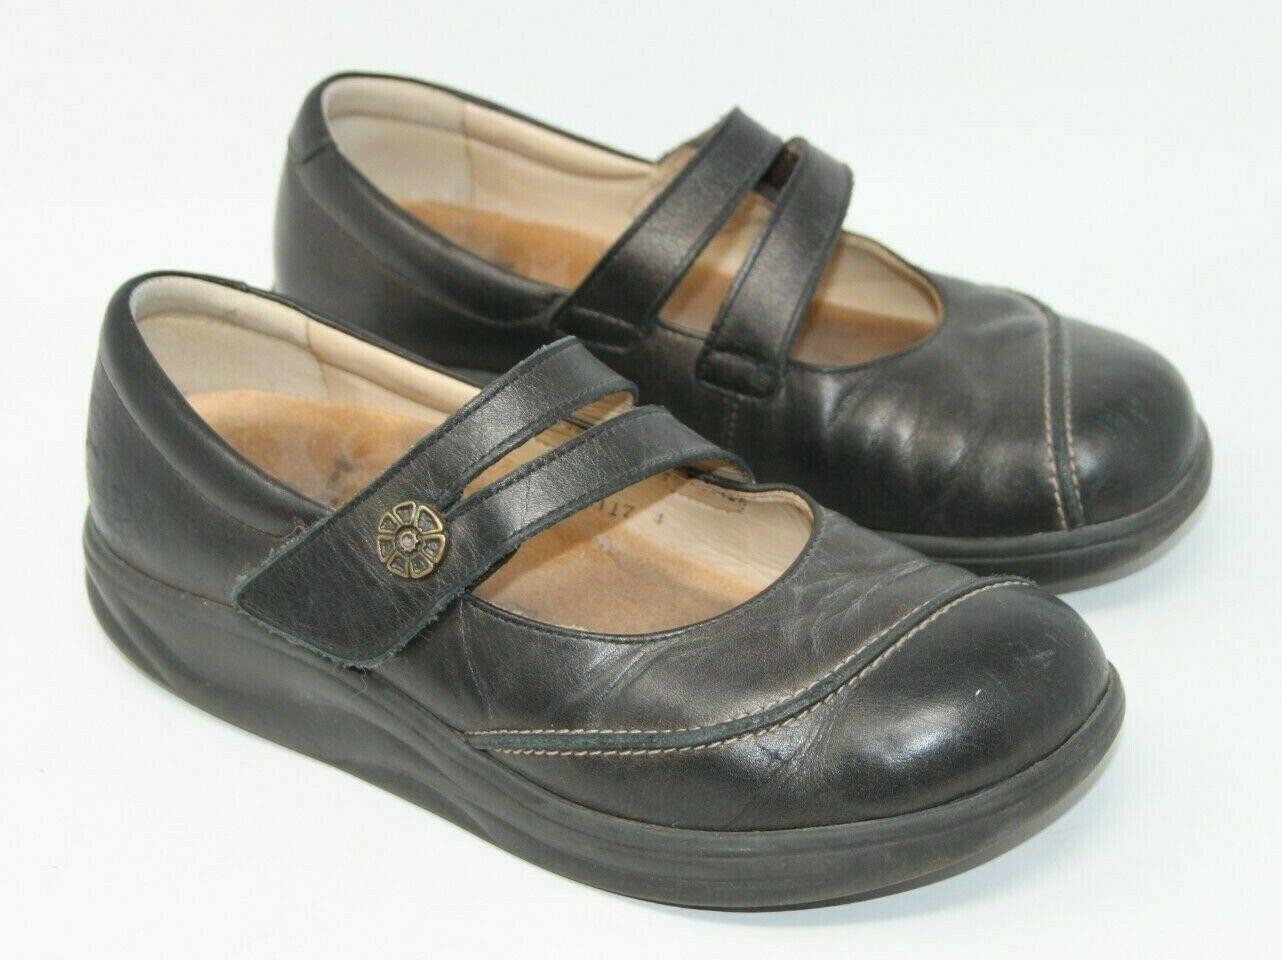 Finn Comfort Size 6.5 M Black Mary Jane Hook & Loop Comfort Orthopedic Shoes